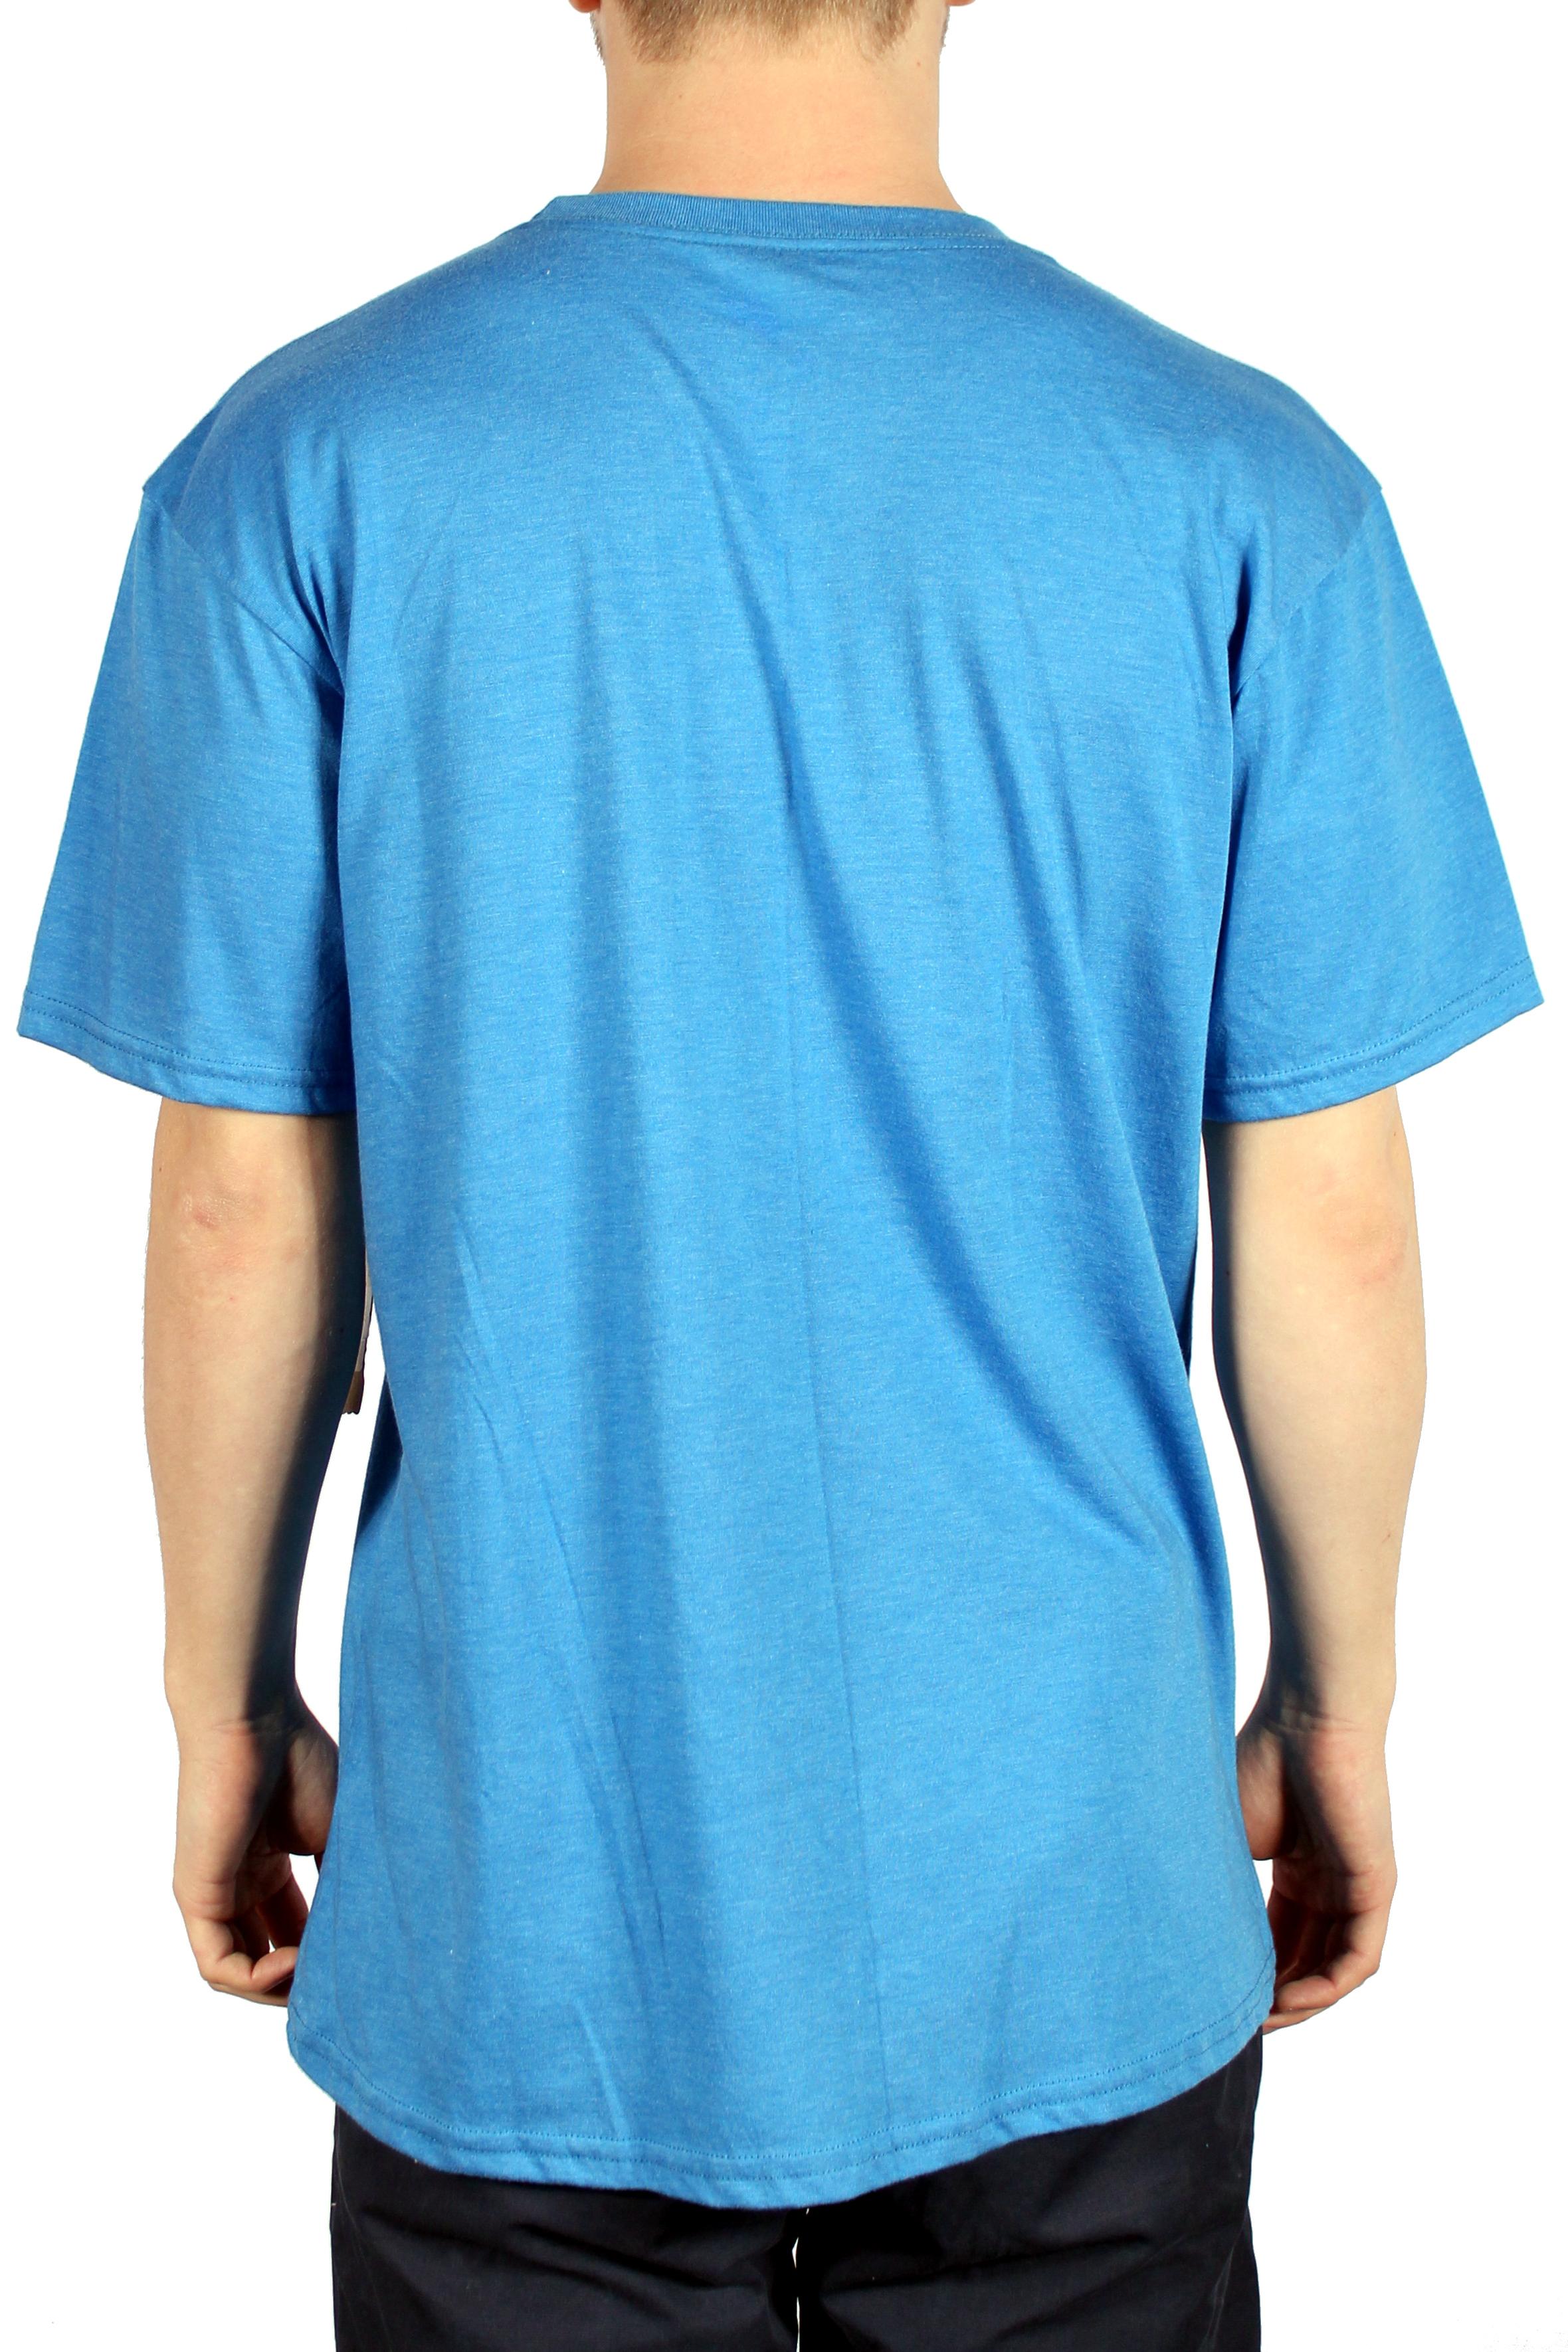 Koszulka Burton Griswold Recycled (Heather Cove)